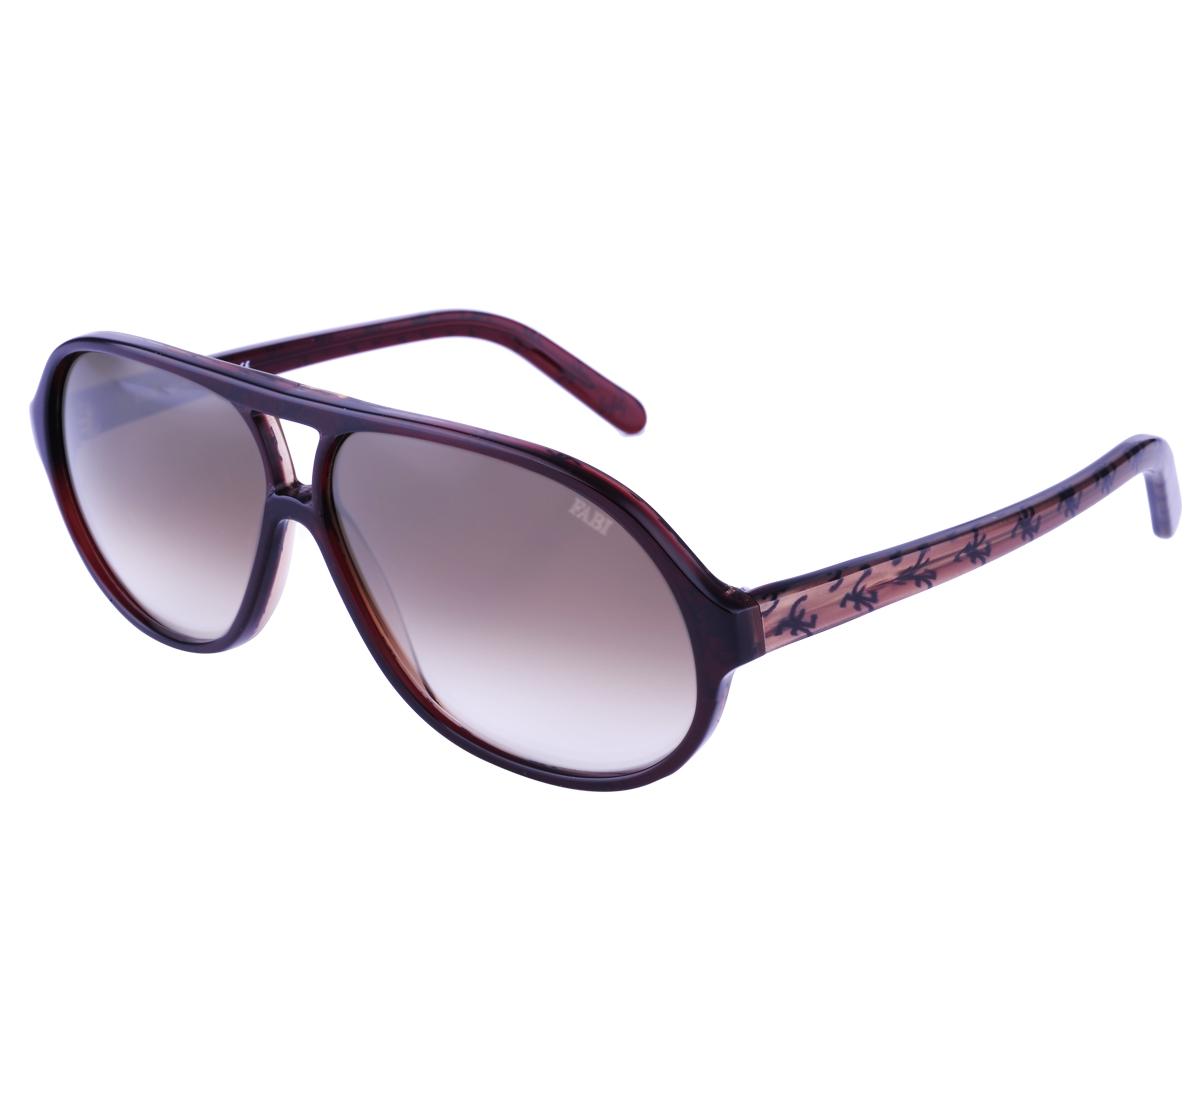 70s Style Aviator Sunglasses | Louisiana Bucket Brigade